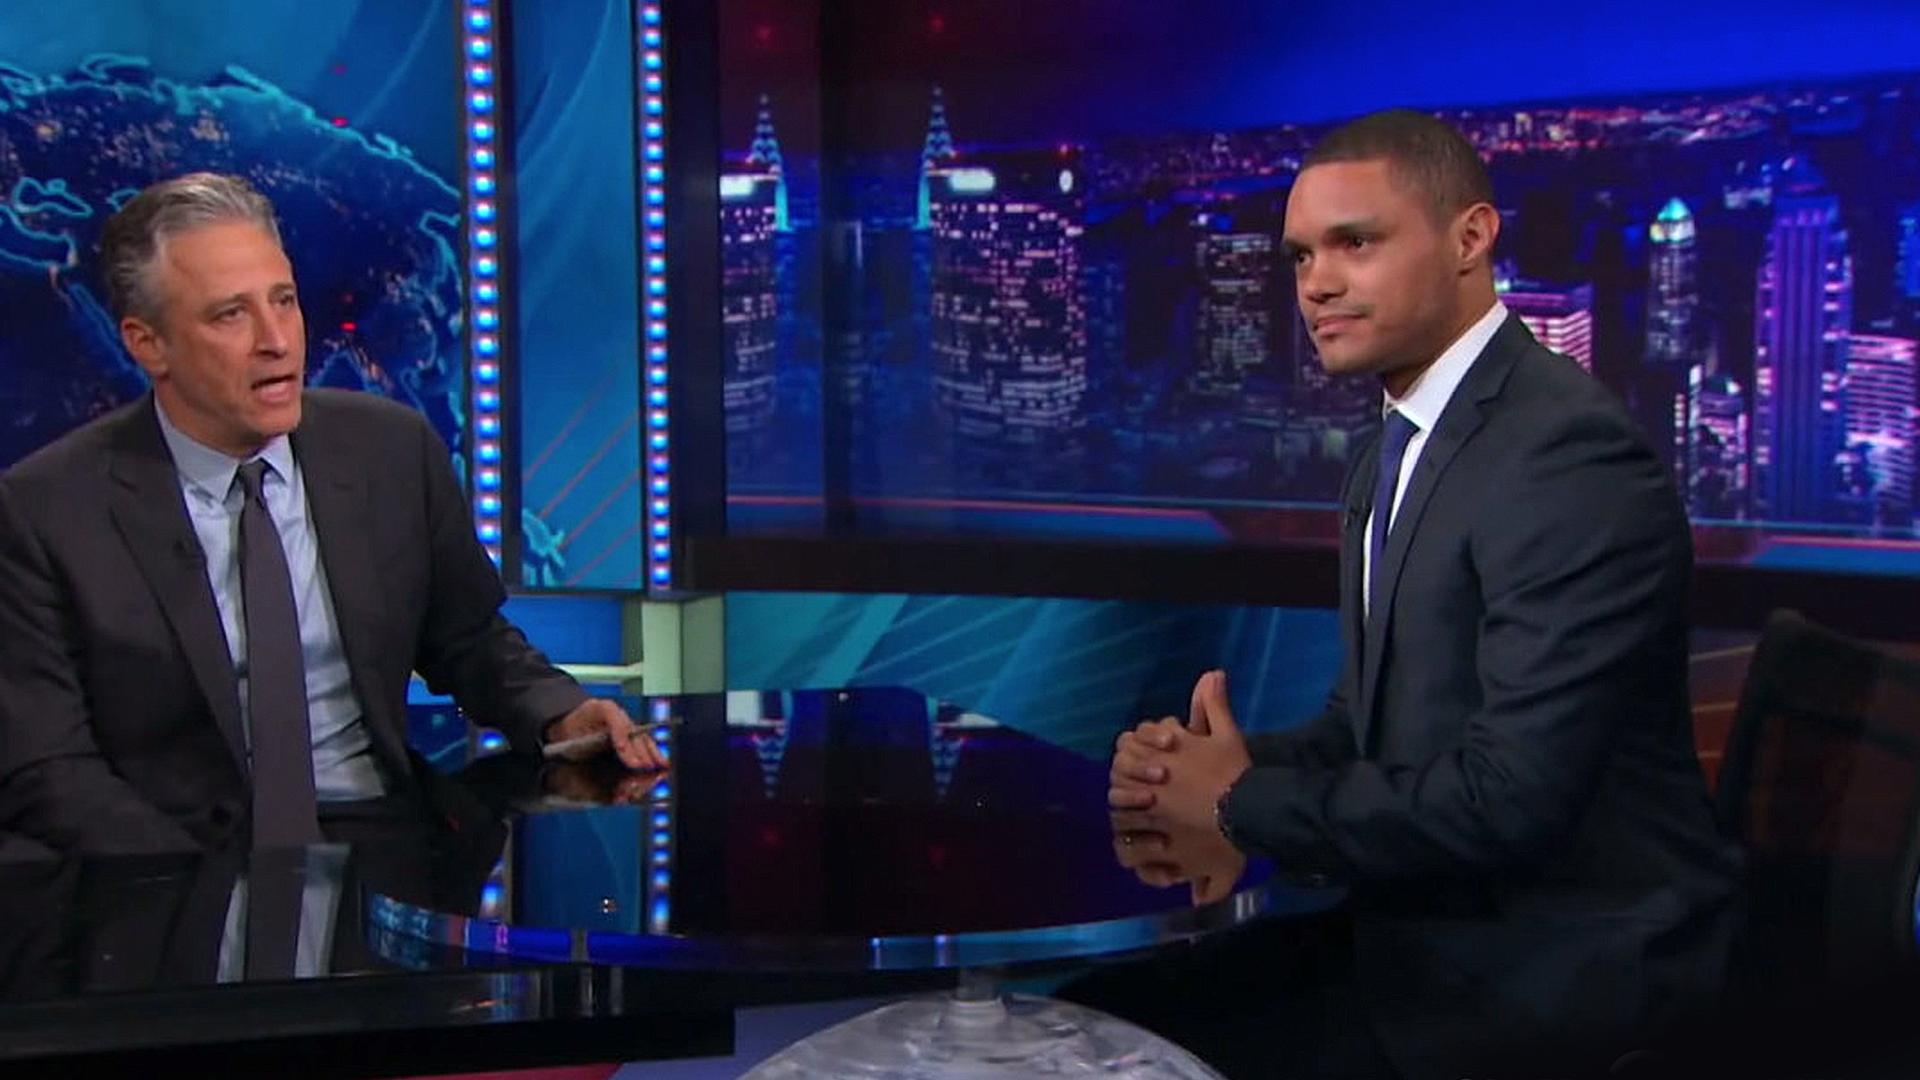 Trevor Noah vs.Jon Stewart - A Diversity Check on 'The Daily Show,' in Data